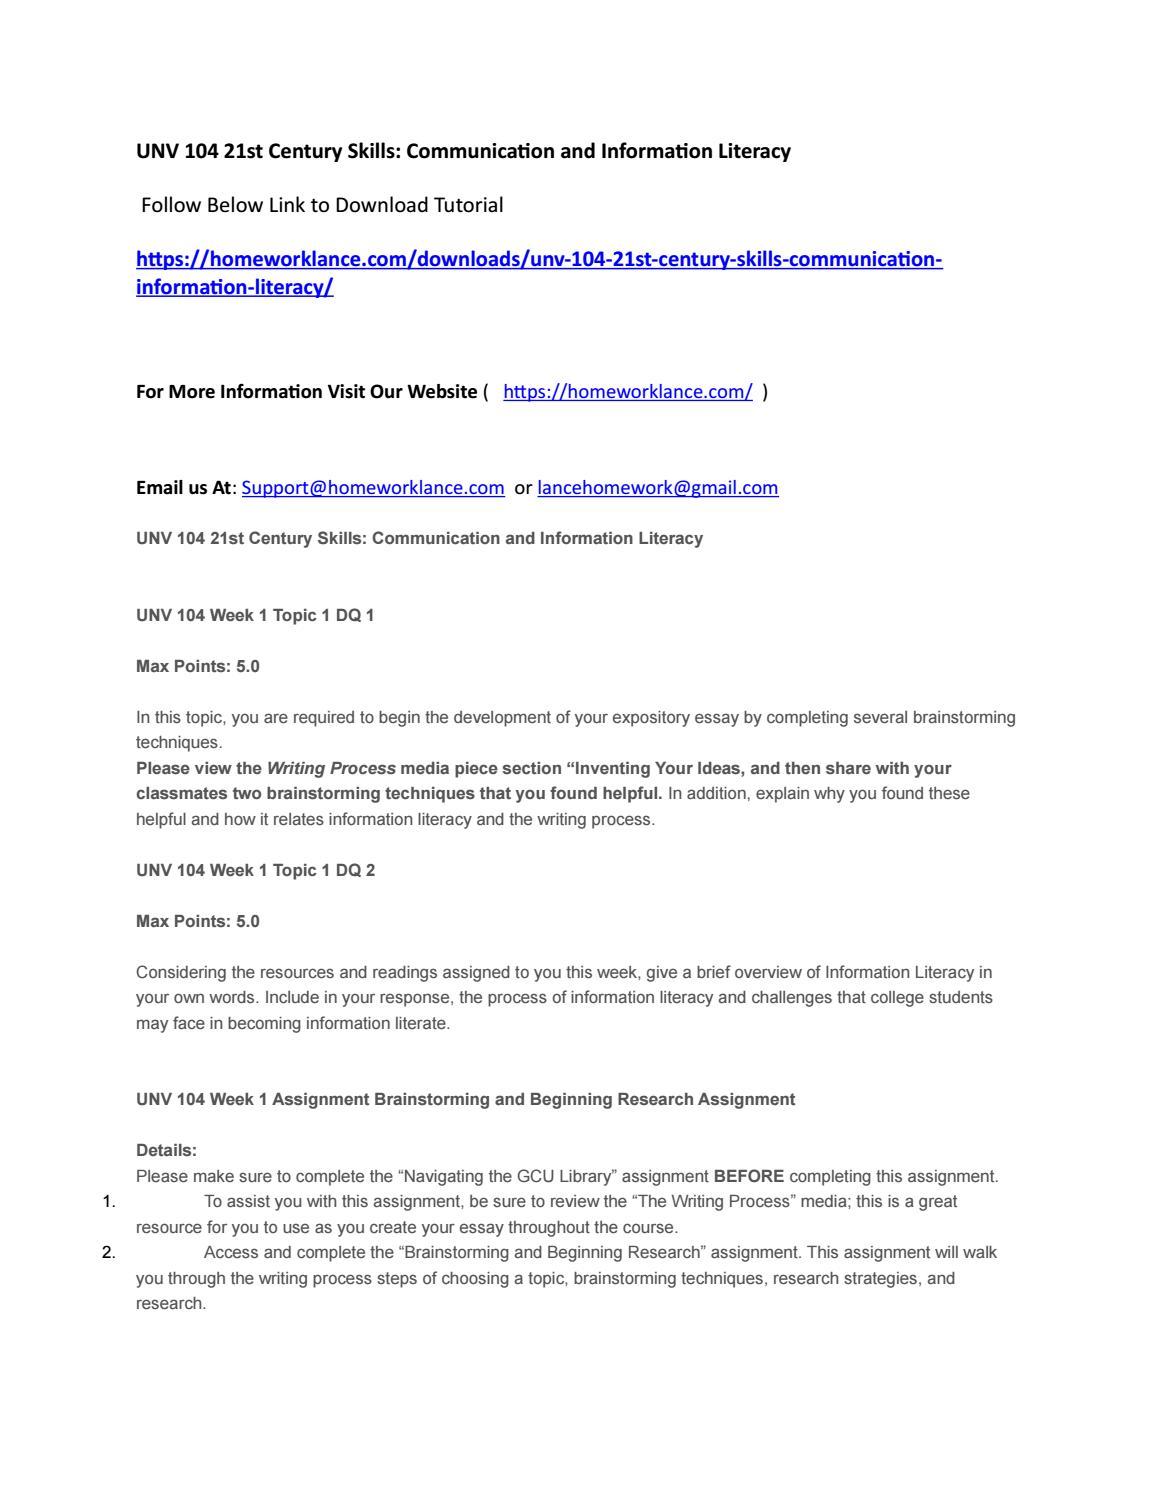 grand canyon university expository essay